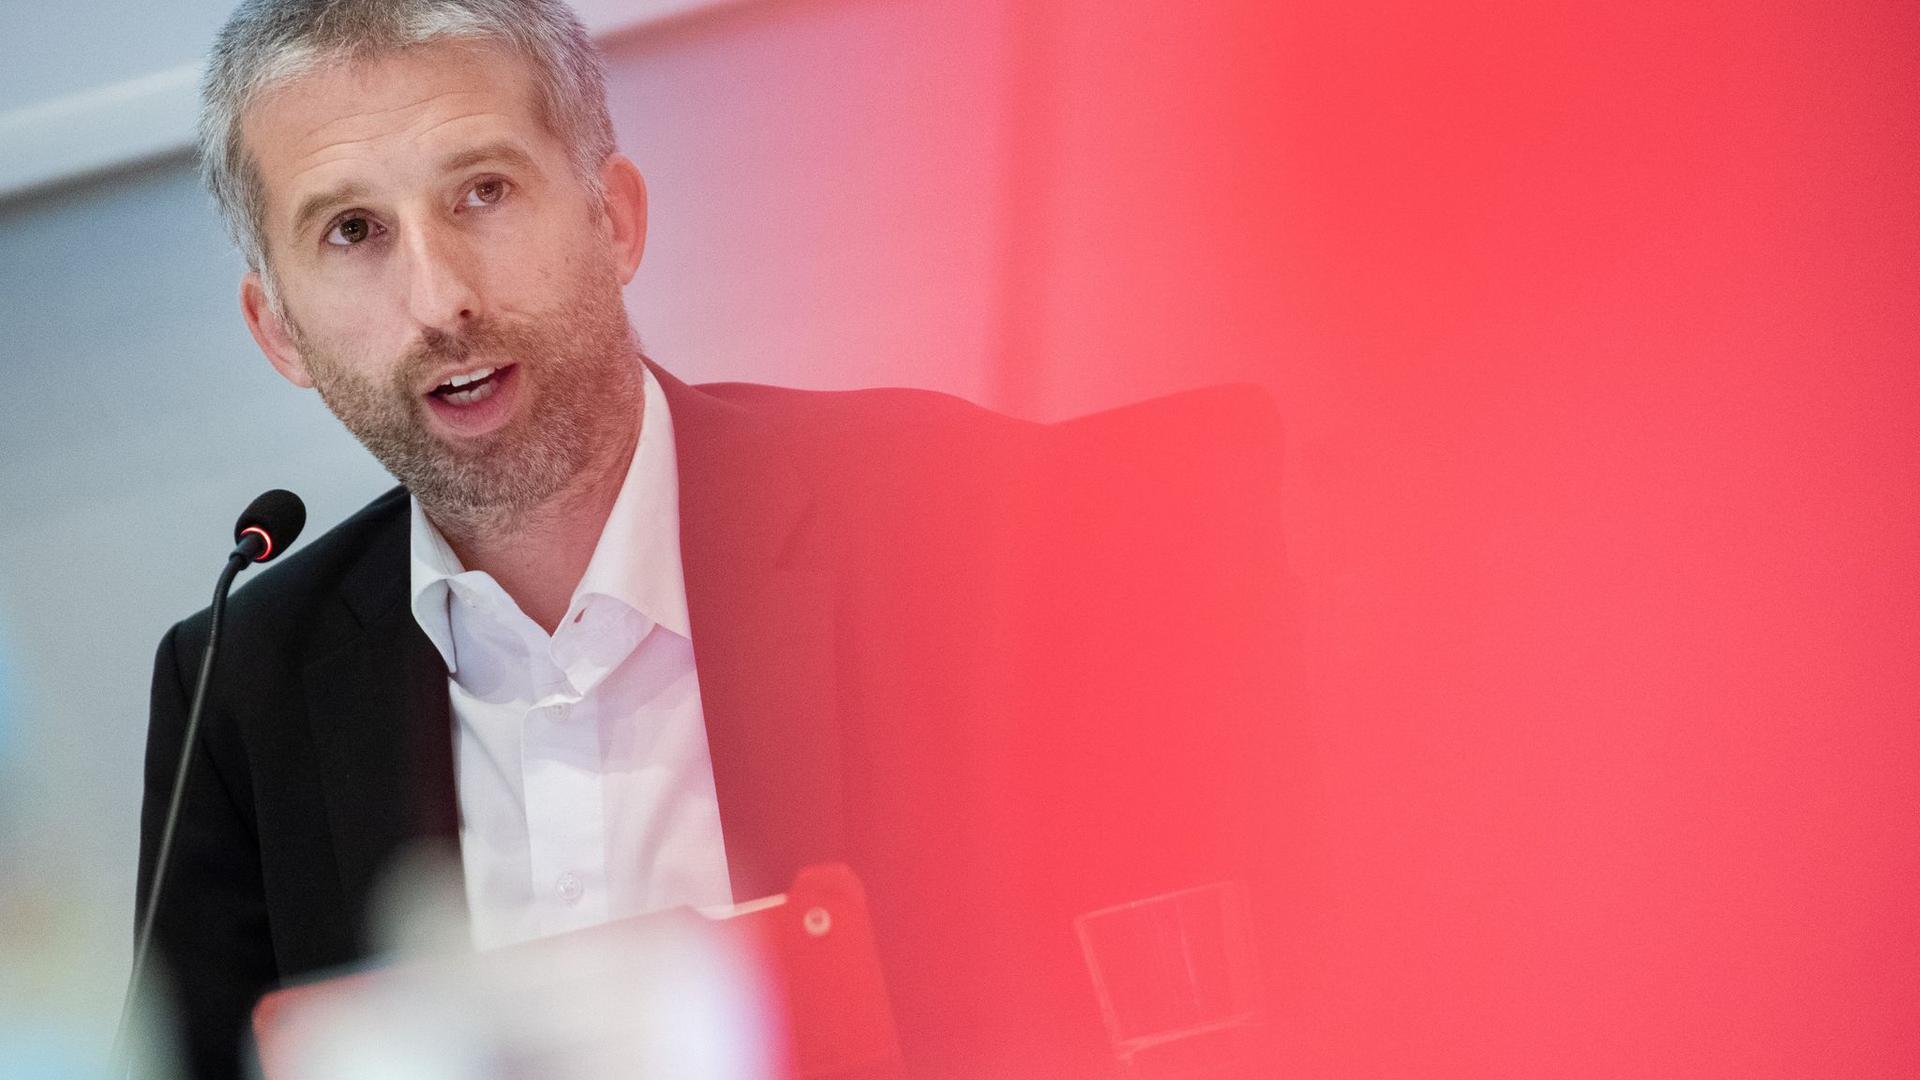 Tübingens Oberbürgermeister Boris Palmer (Grüne) nimmt an einer Sitzung teil.